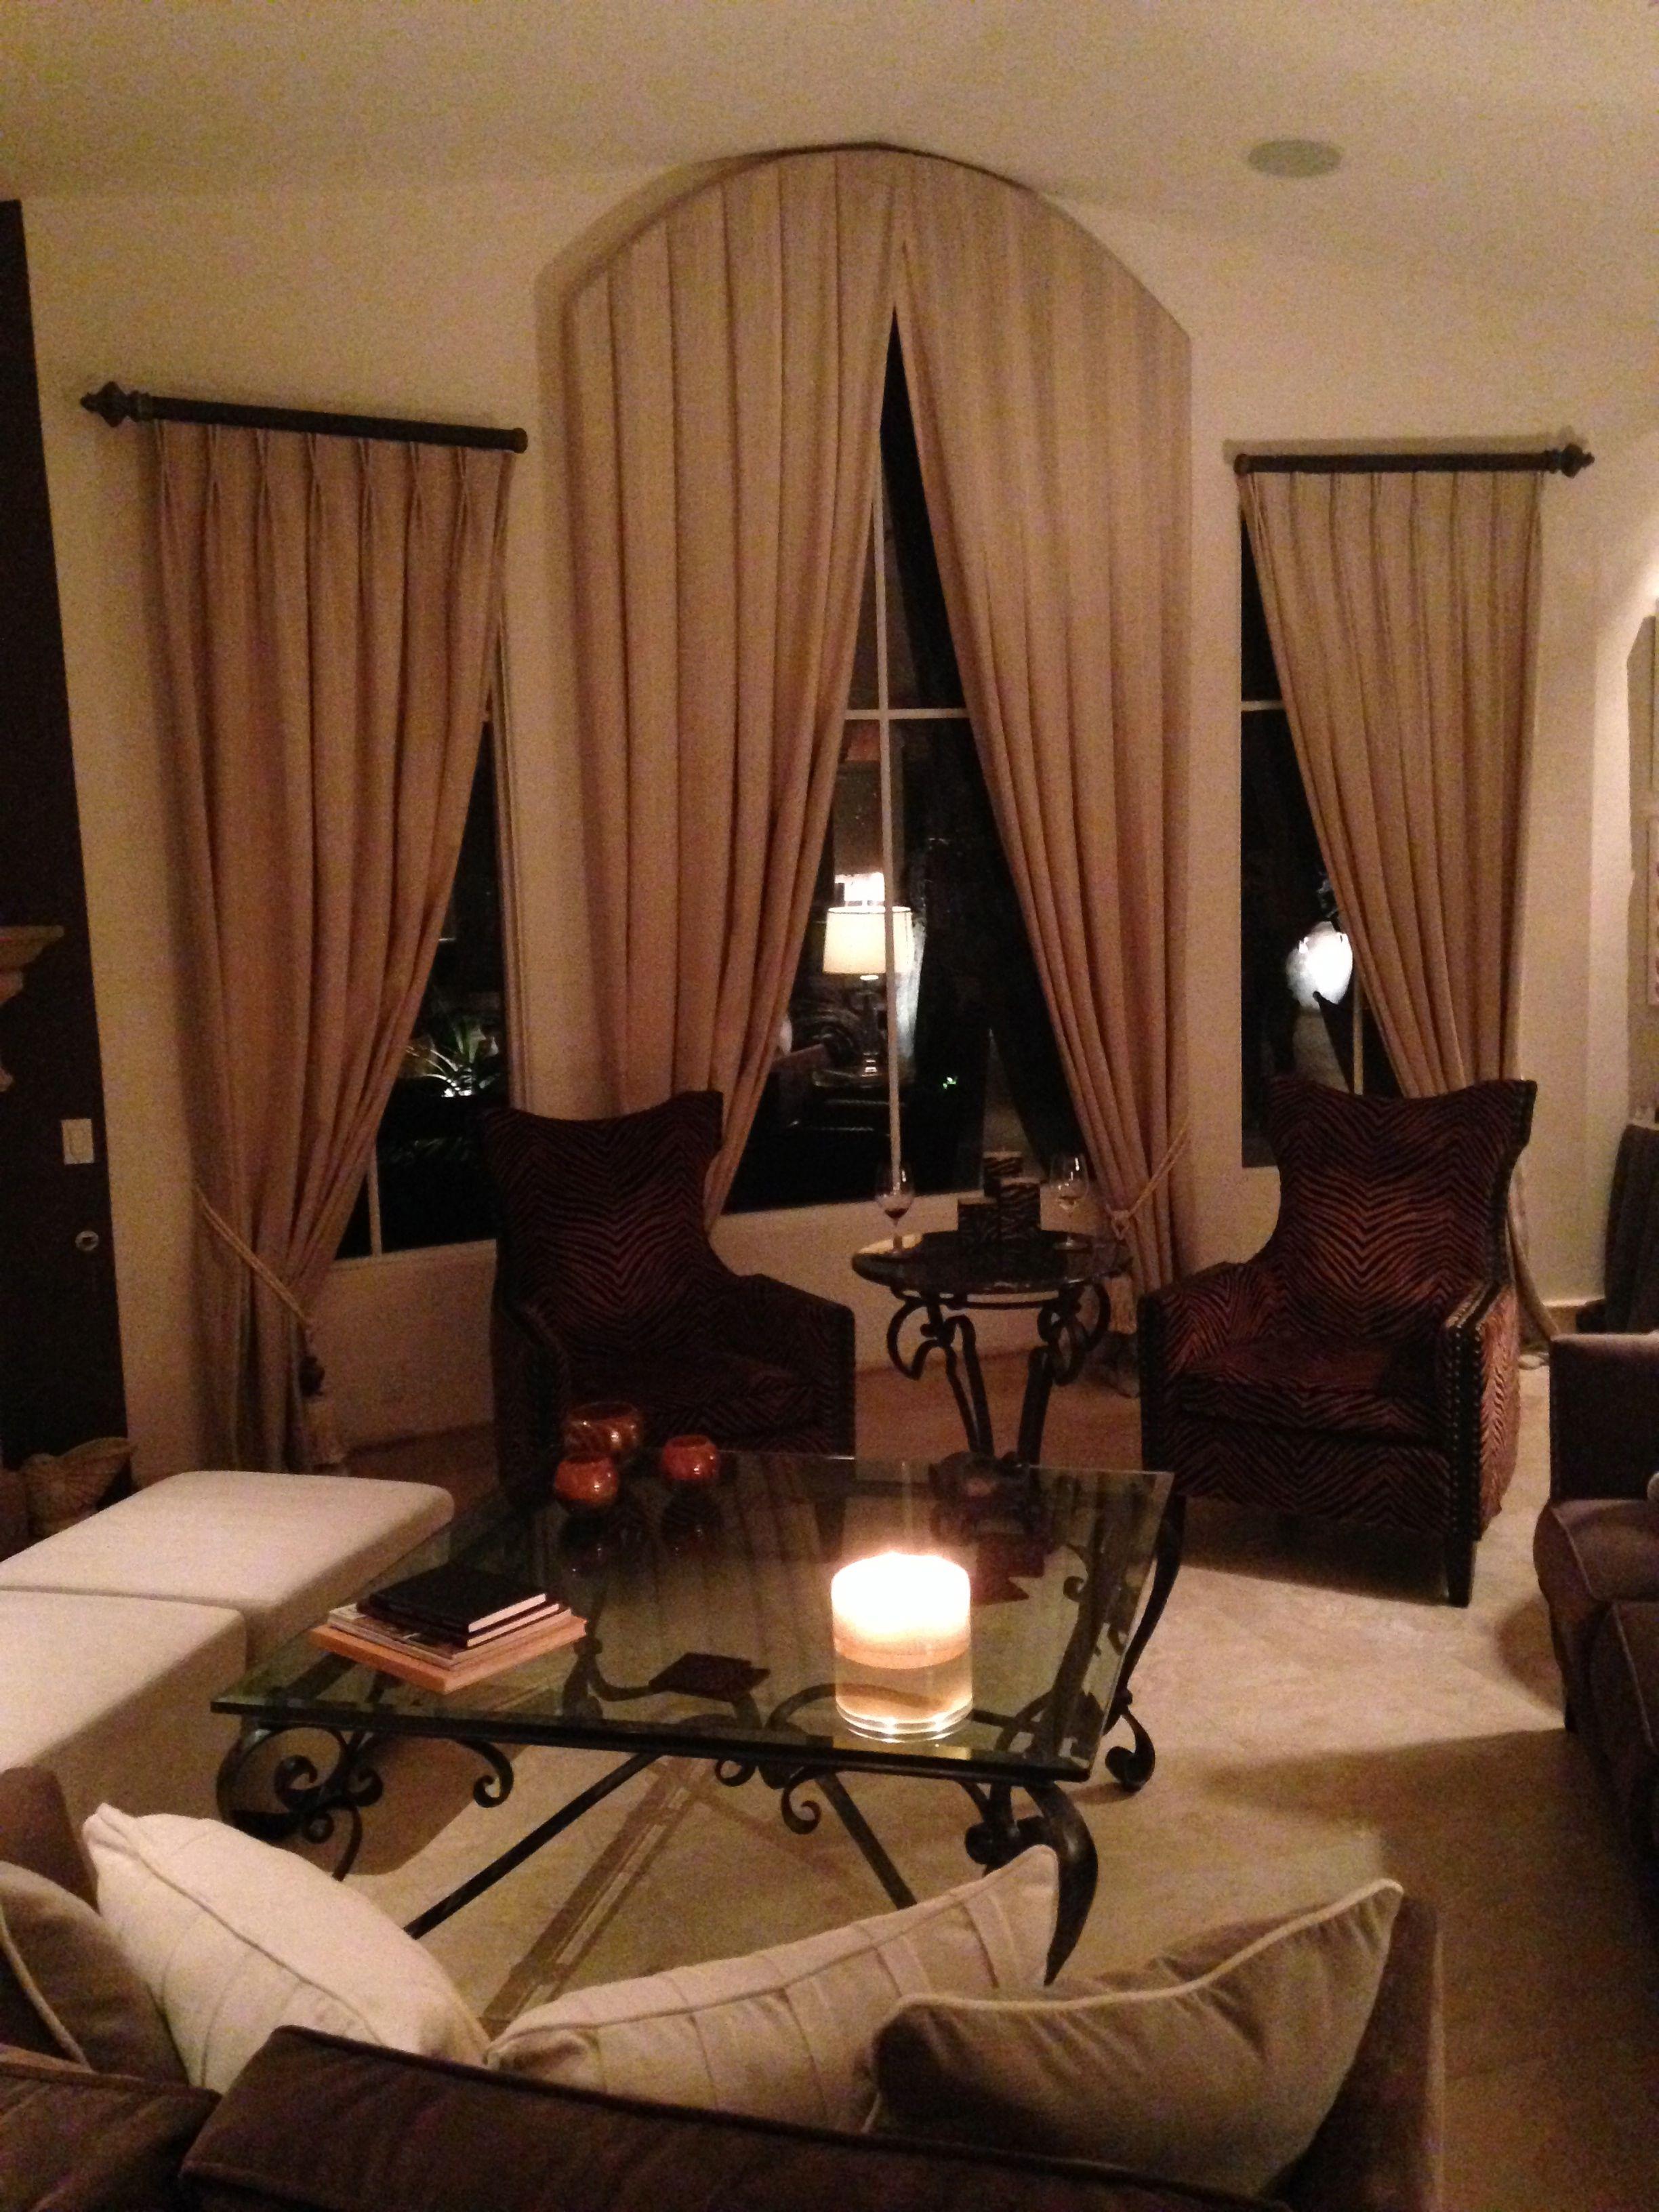 Window treatment design by Cielo Interiors